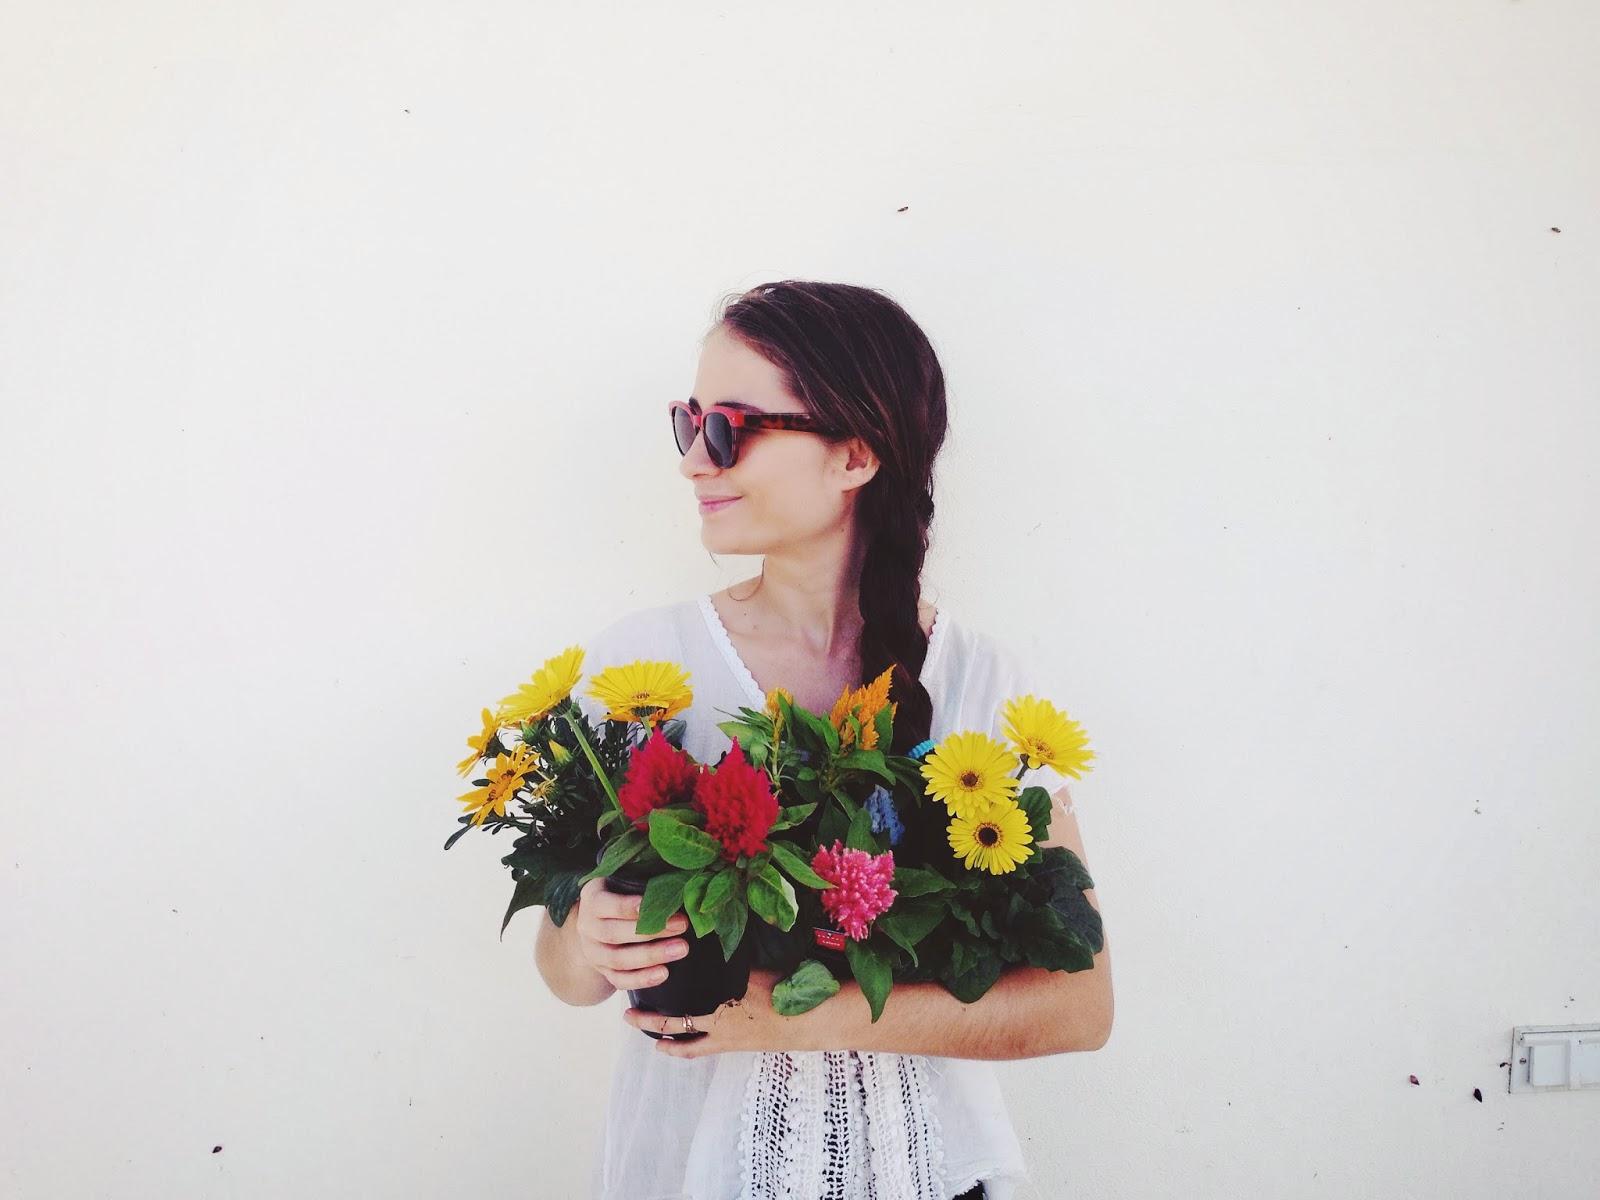 Jessthetics / An Interview withOh Dear Drea